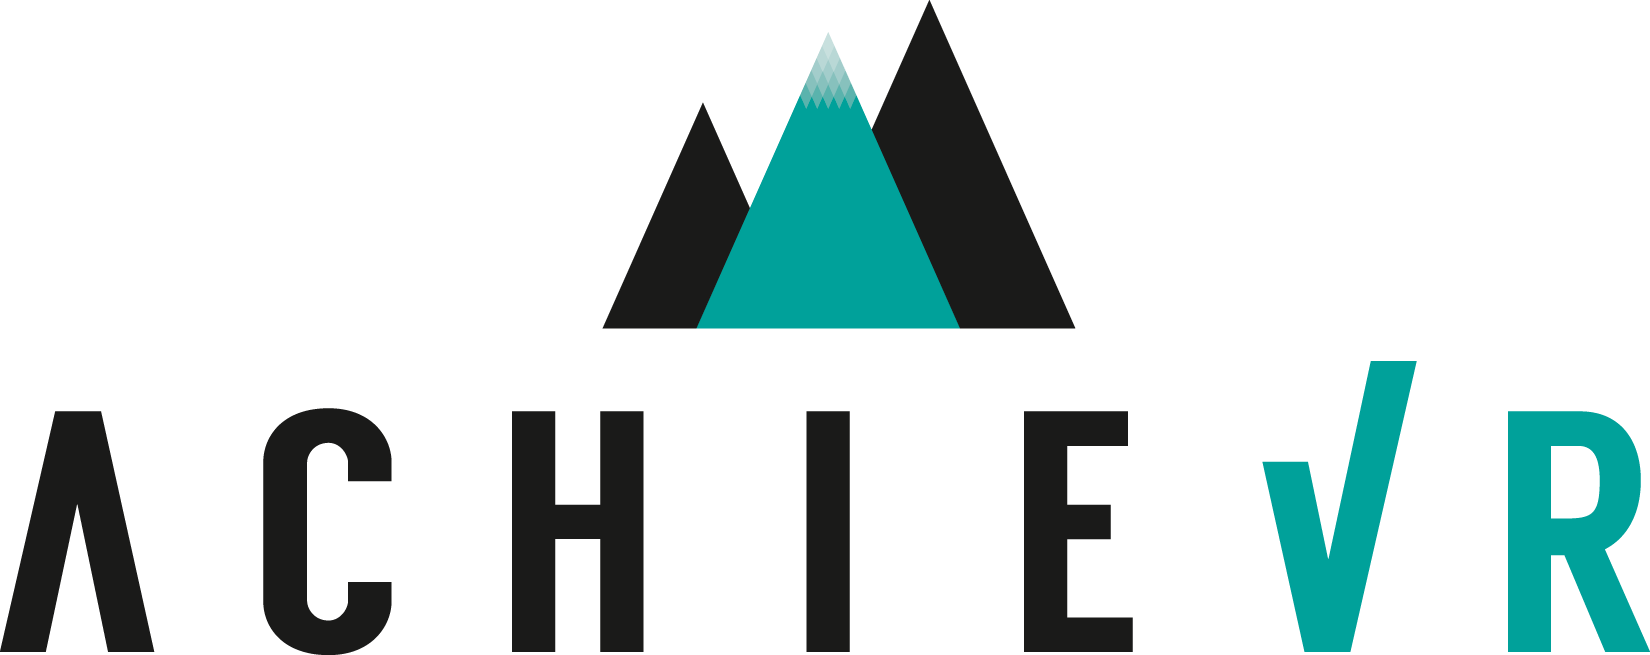 ACHIEVR_Logo_COL.png